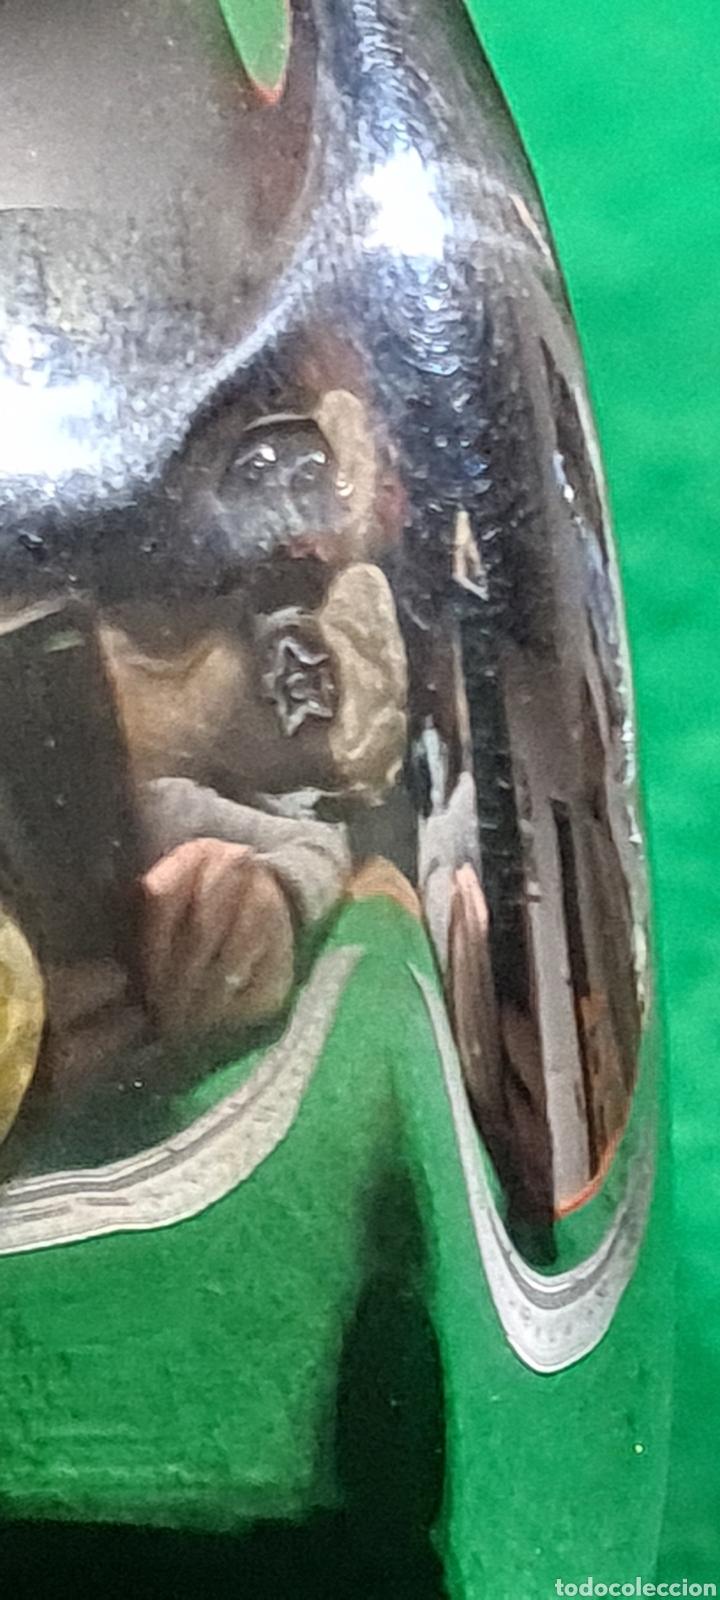 Antigüedades: Precioso candelabro, portavela. Con plata. - Foto 8 - 265438314